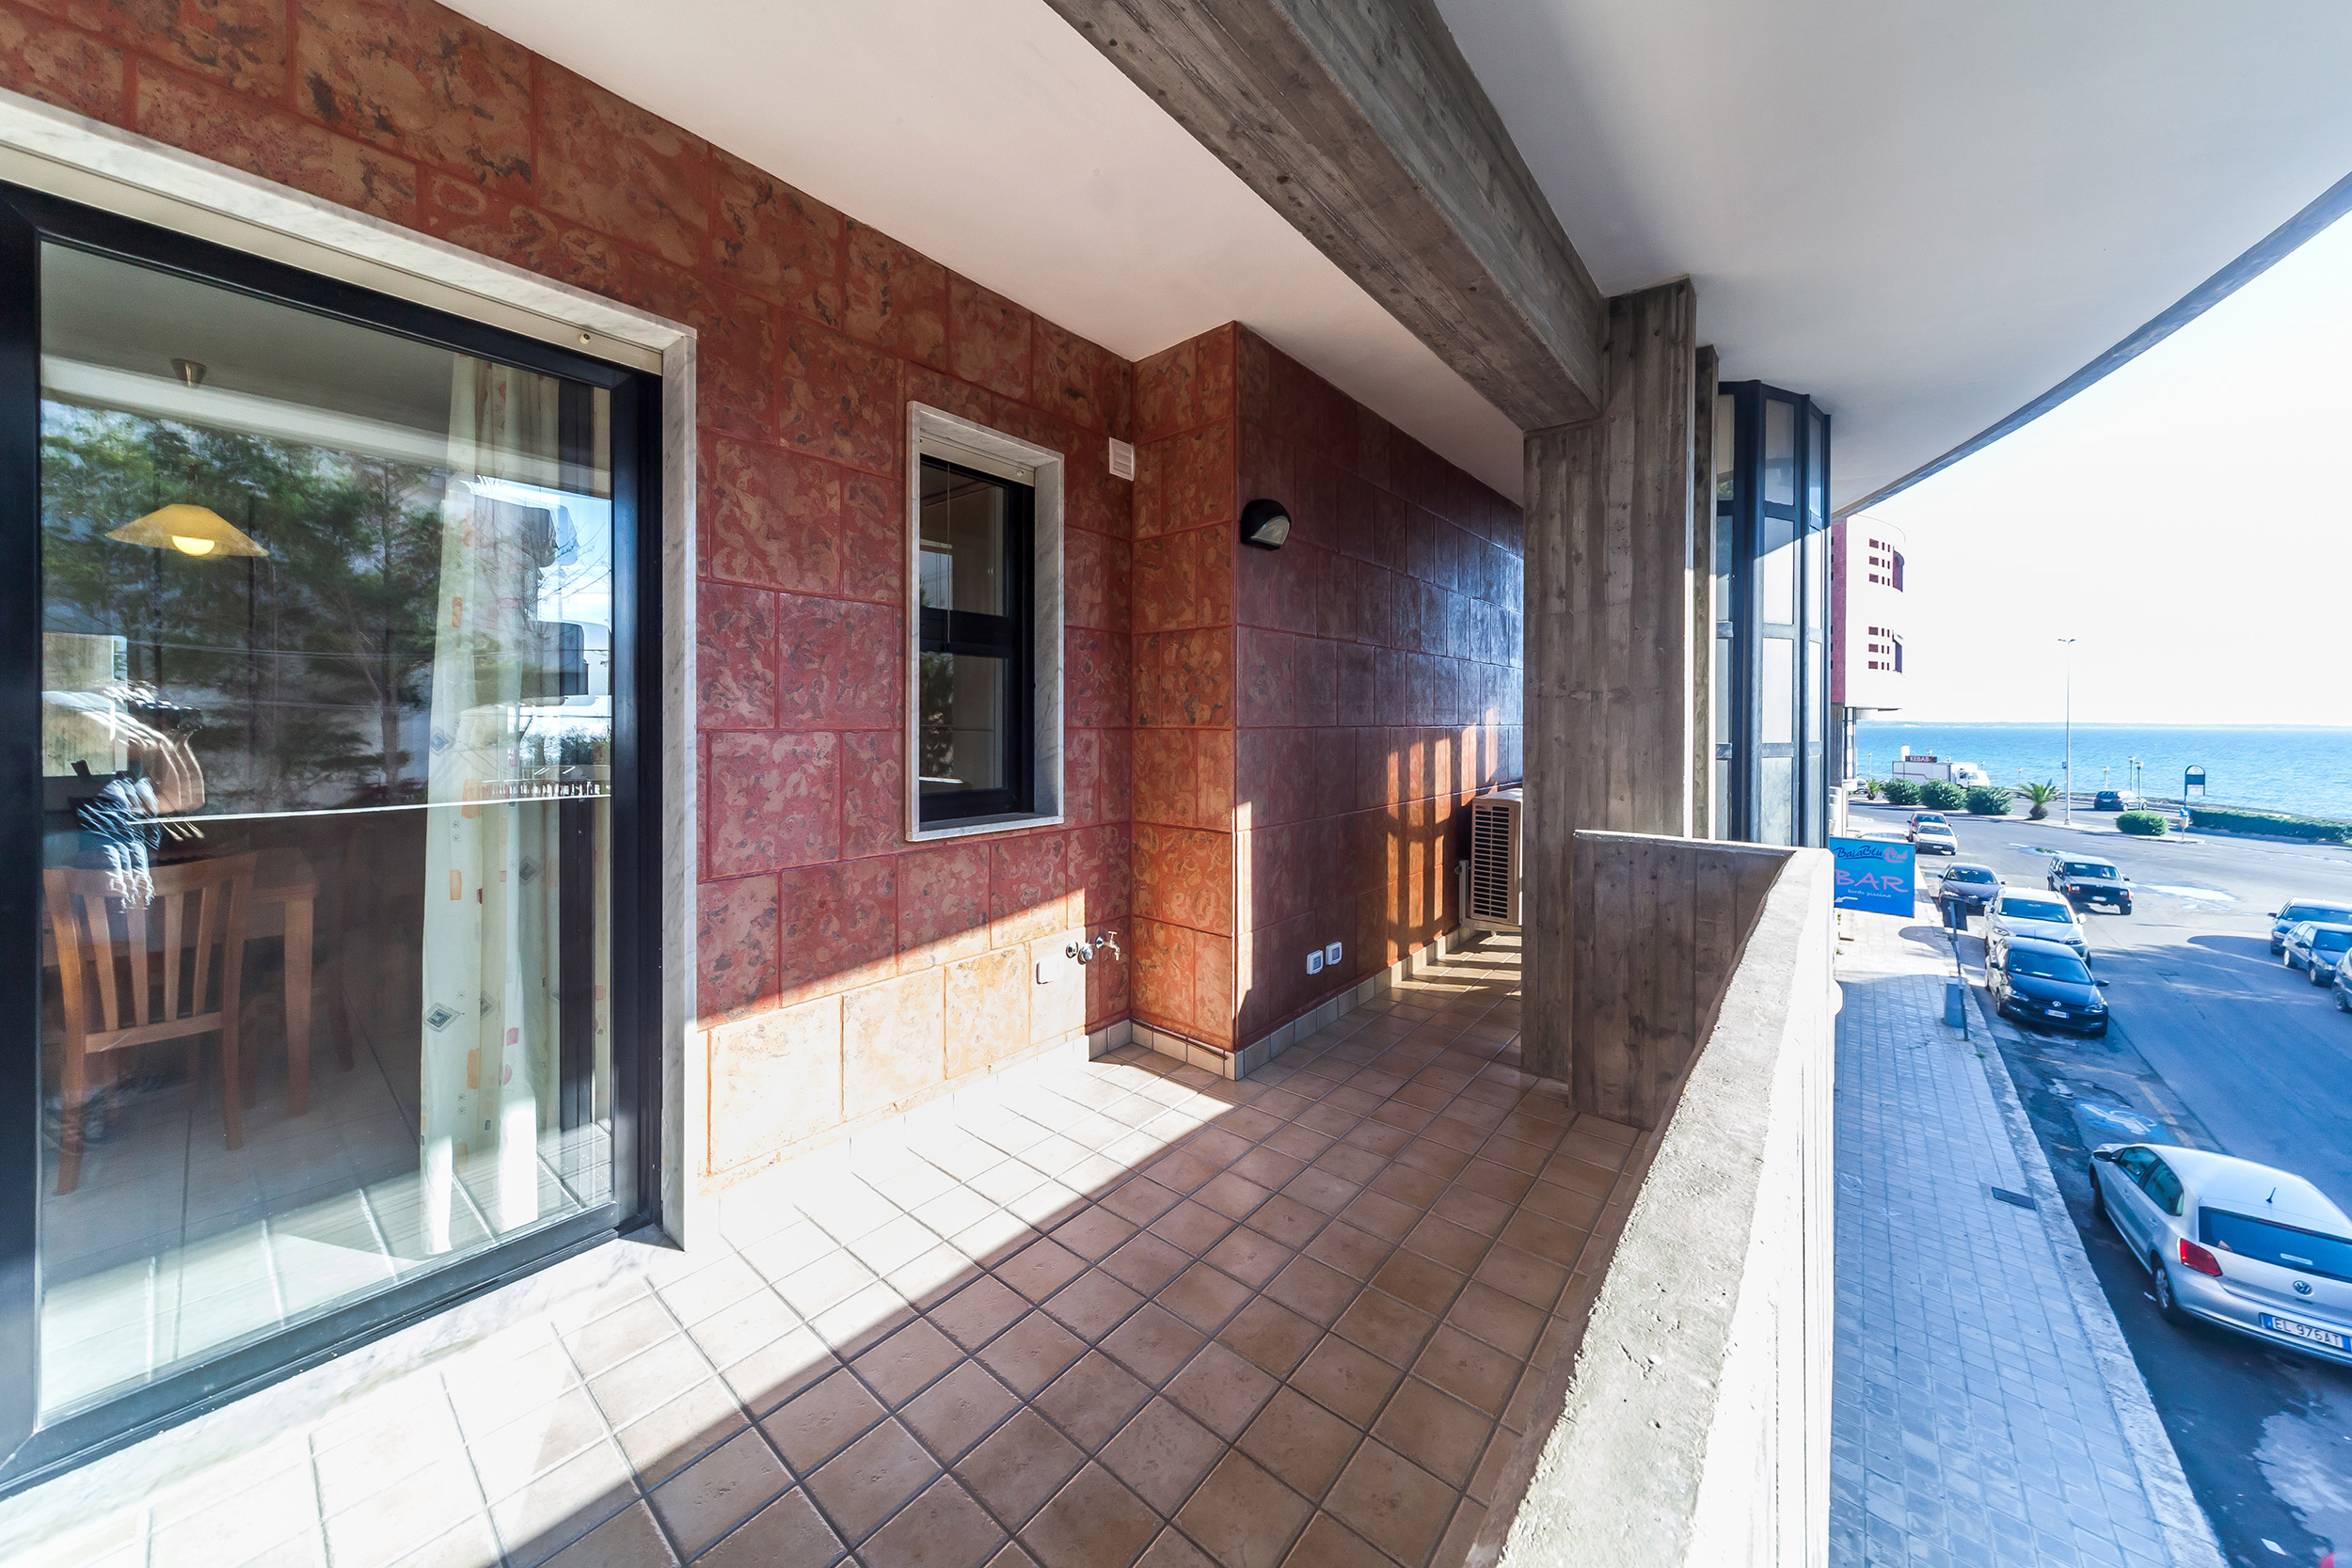 Ferienwohnung Appartamento vista mare a Gallipoli 4/6 posti - Baia Blu Side (2574458), Gallipoli, Lecce, Apulien, Italien, Bild 1